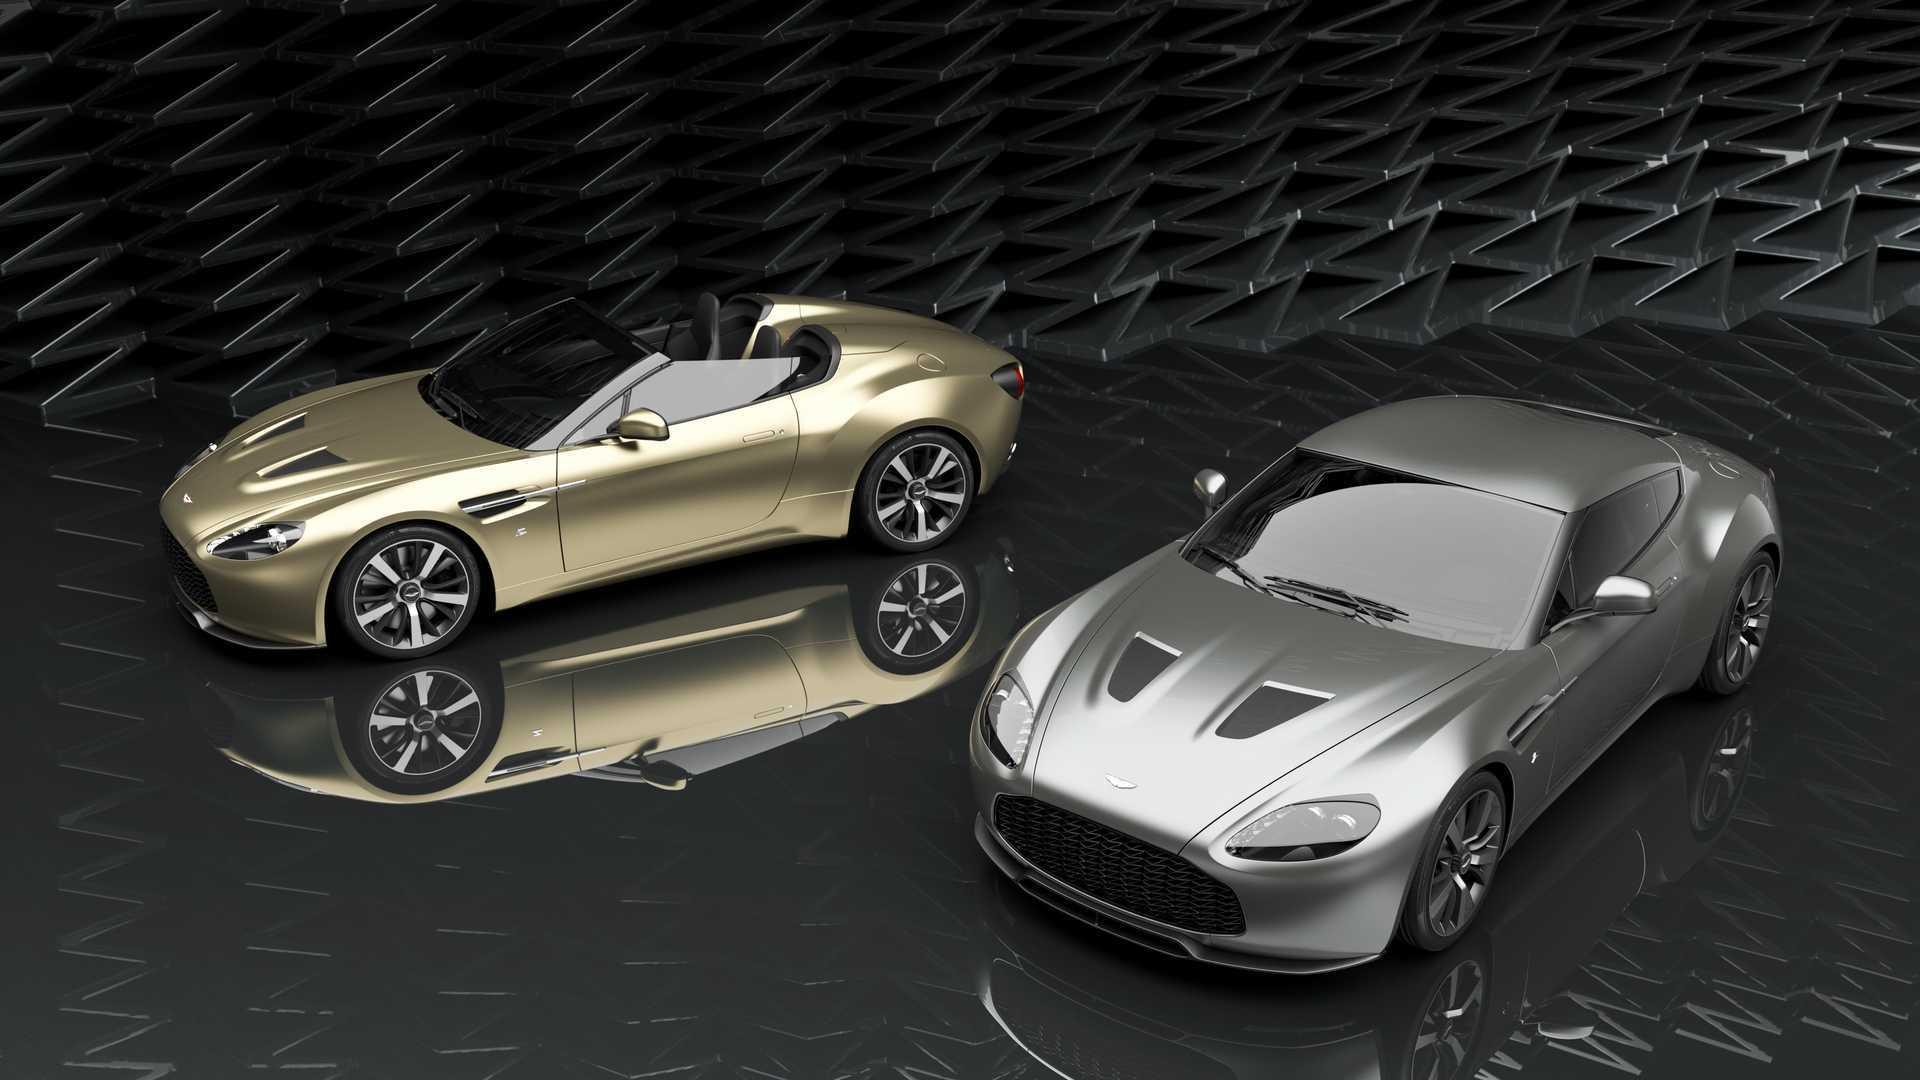 Aston Martin Vantage V12 Zagato Heritage Twins Are Hand Built Beauties